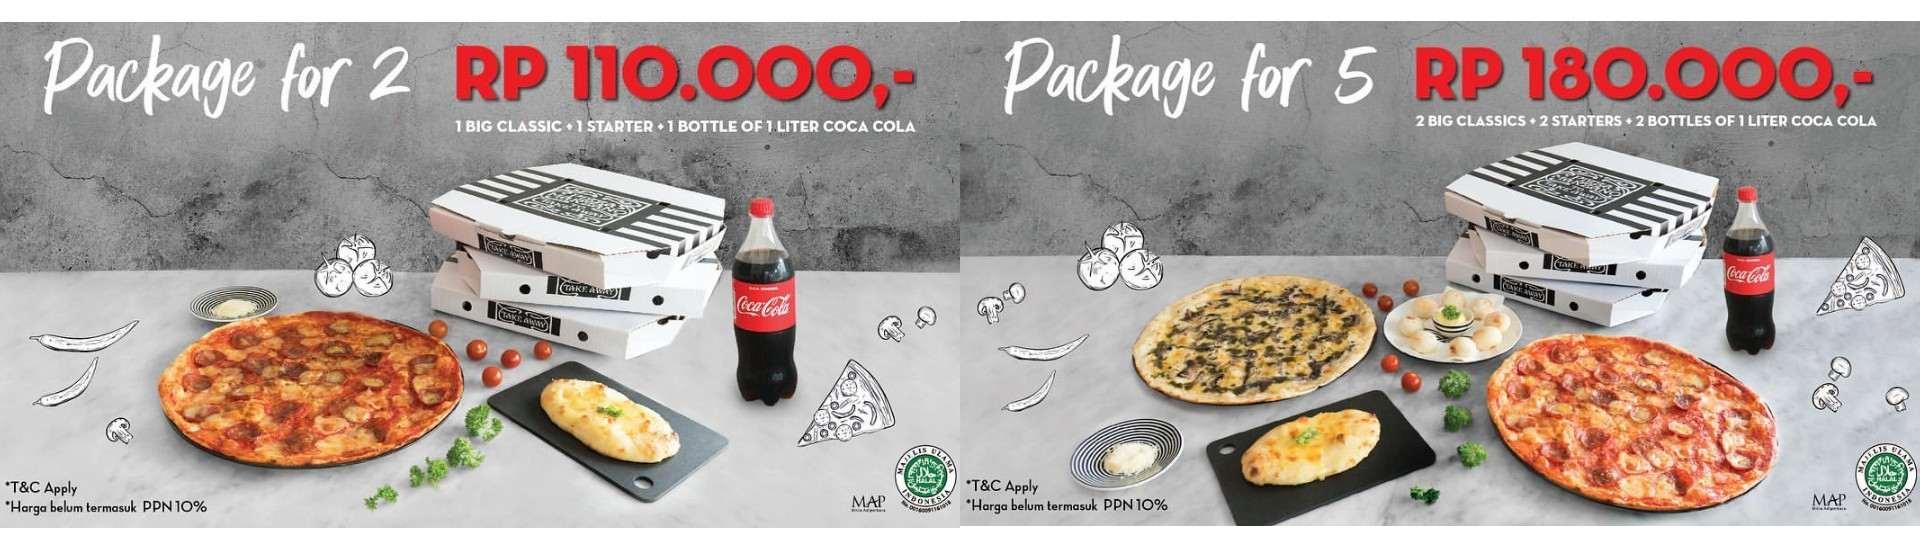 PIZZA MARZANO Promo Paket Spesial khusus GOFOOD + GRATIS Coca Cola 1 Liter